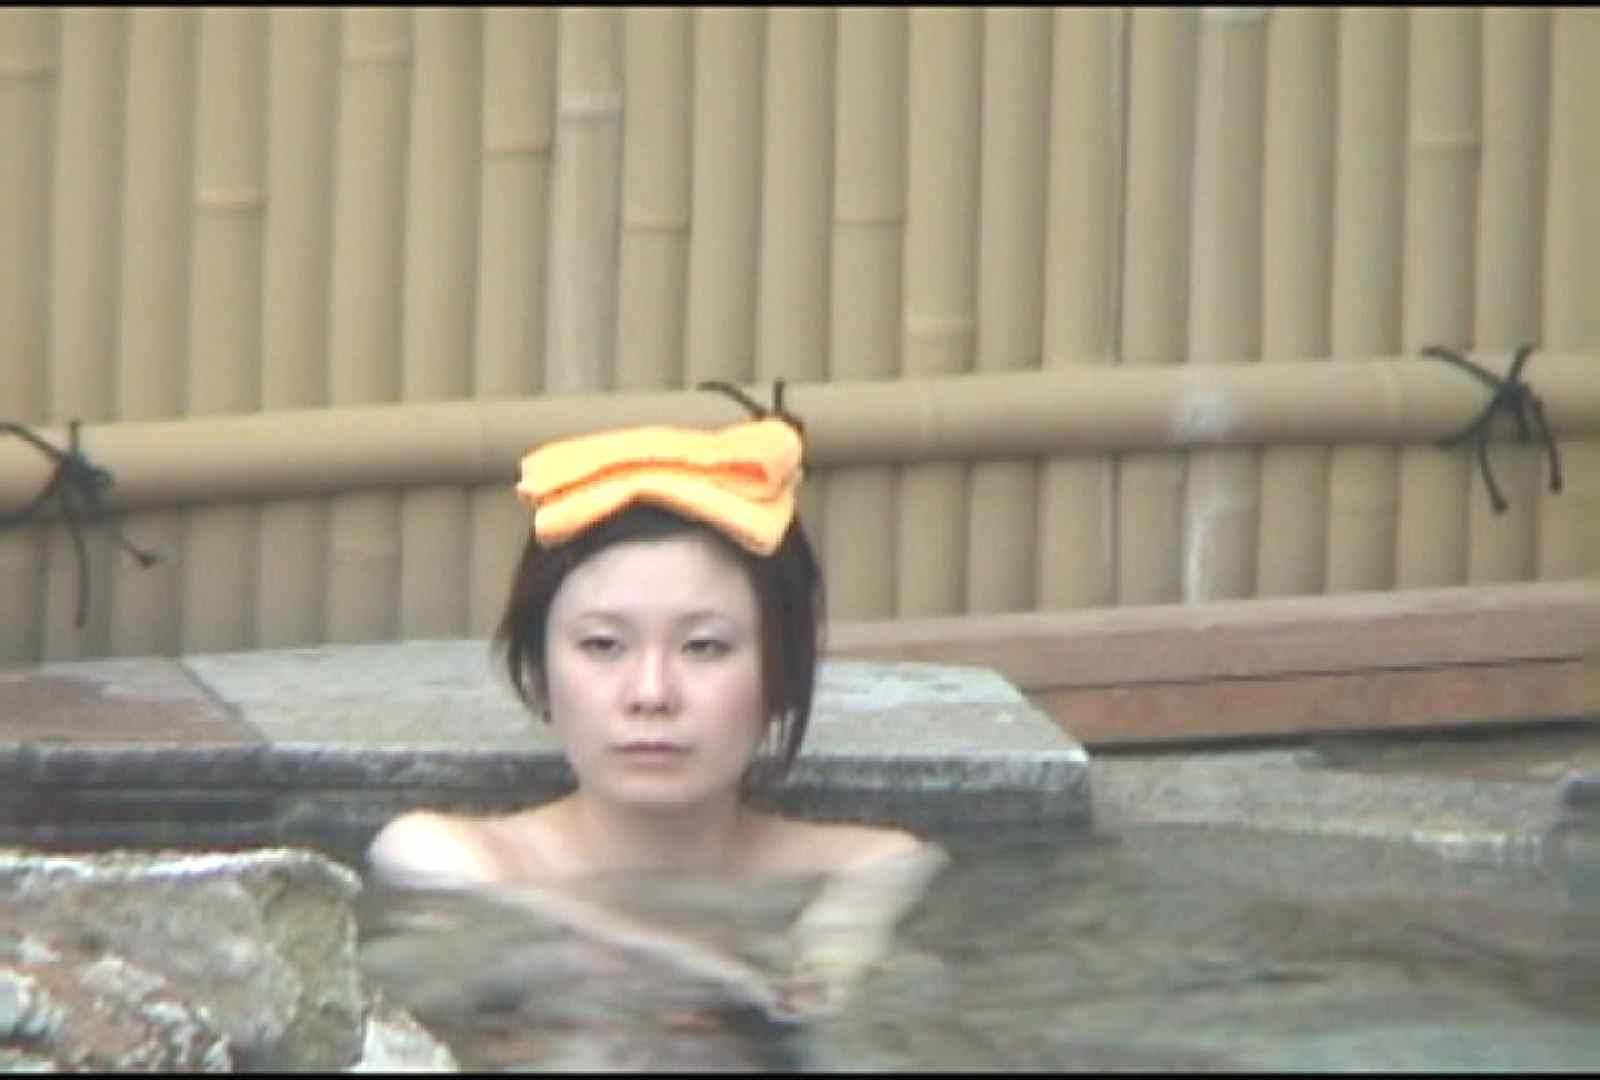 Aquaな露天風呂Vol.177 露天風呂突入 AV動画キャプチャ 102pic 29